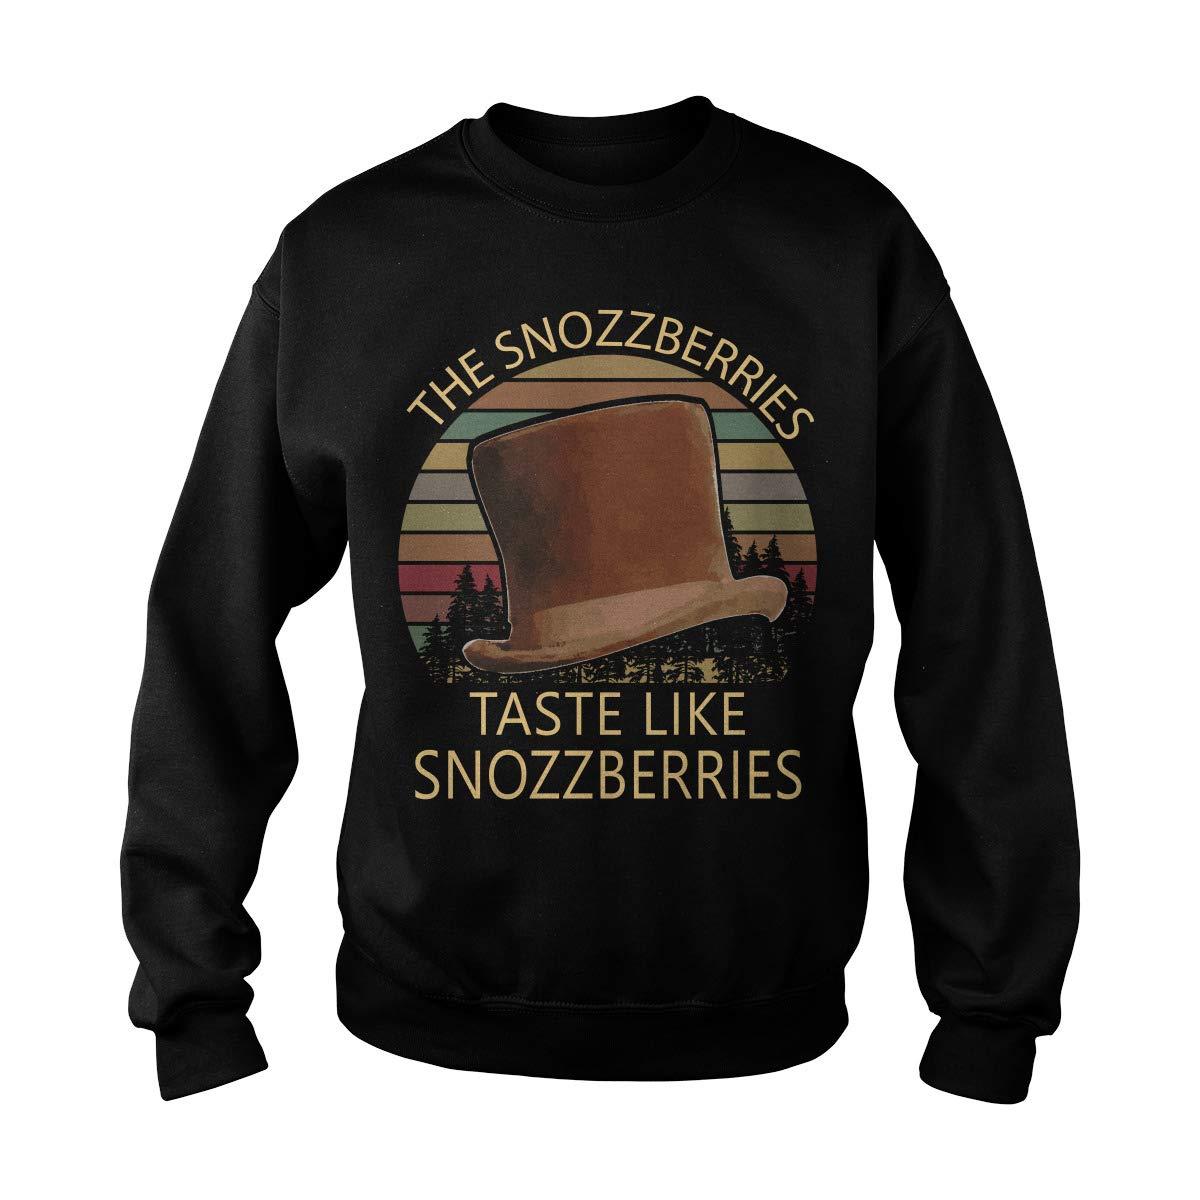 Zinko The Snozzberries Taste Like Snozzberries Adult Crewneck Sweatshirt